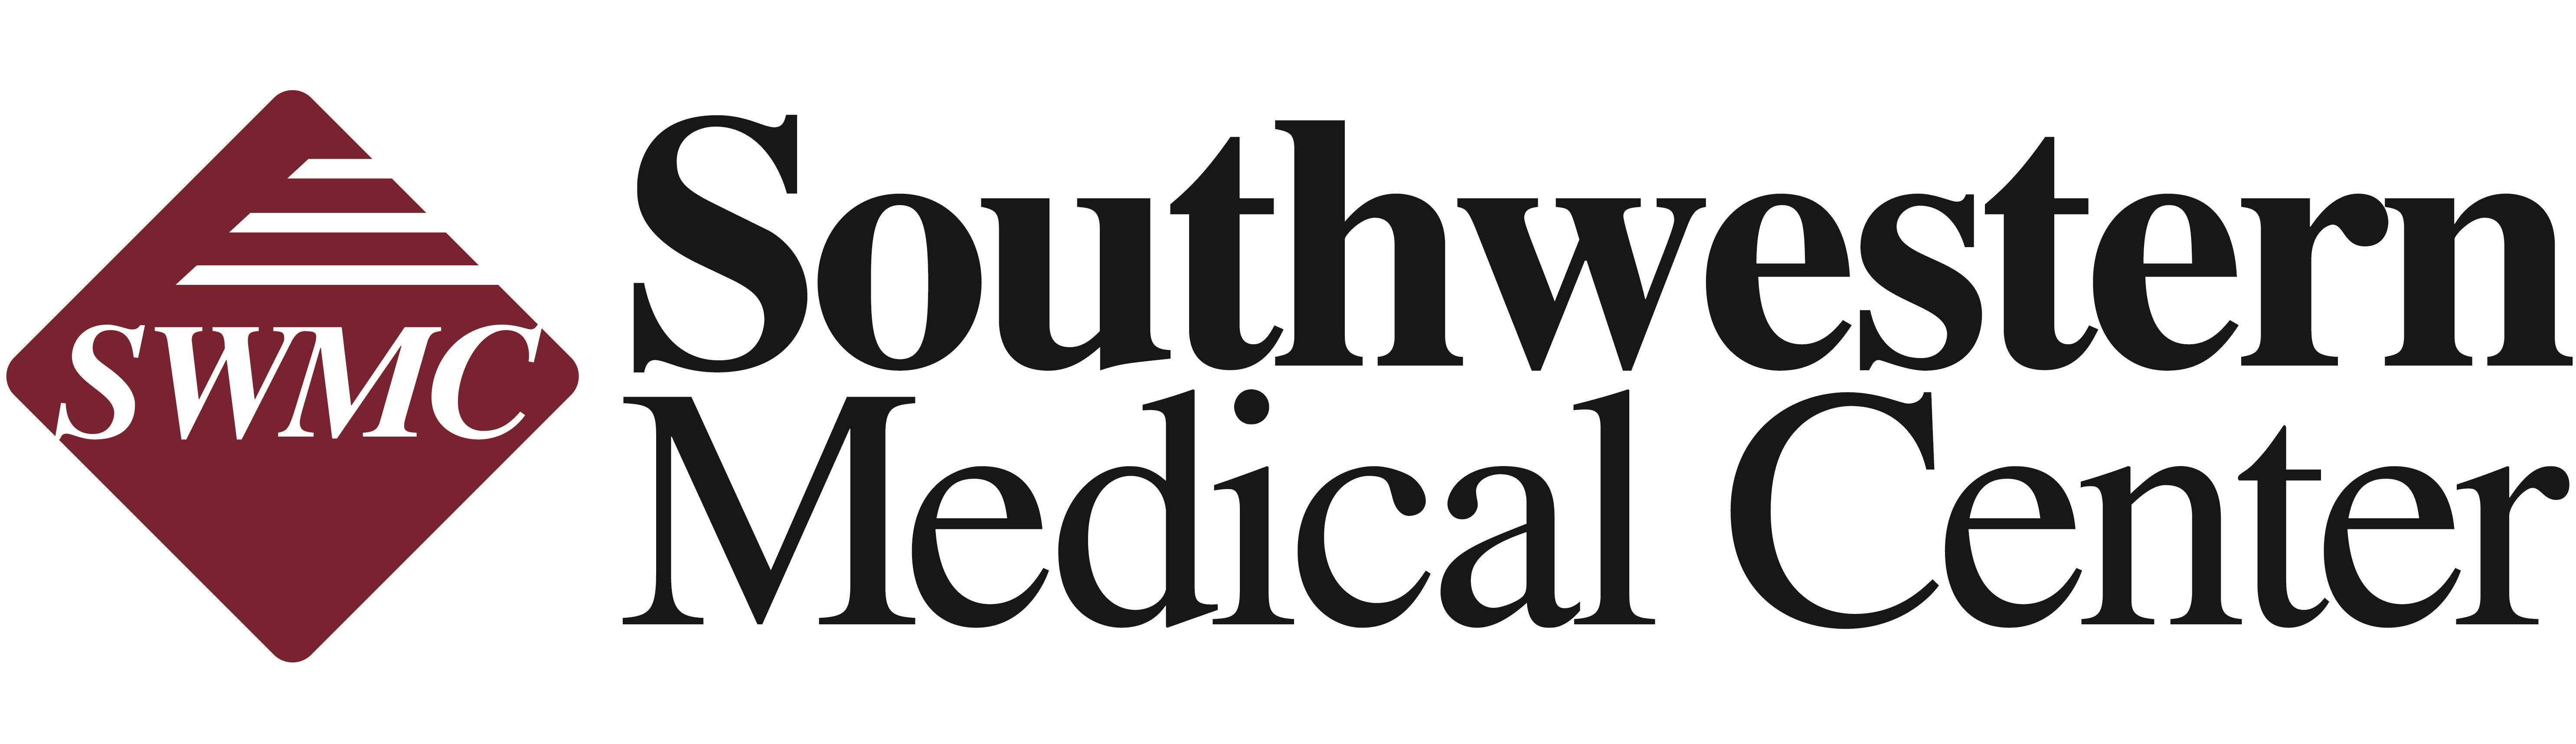 Southwestern Medical Center logo